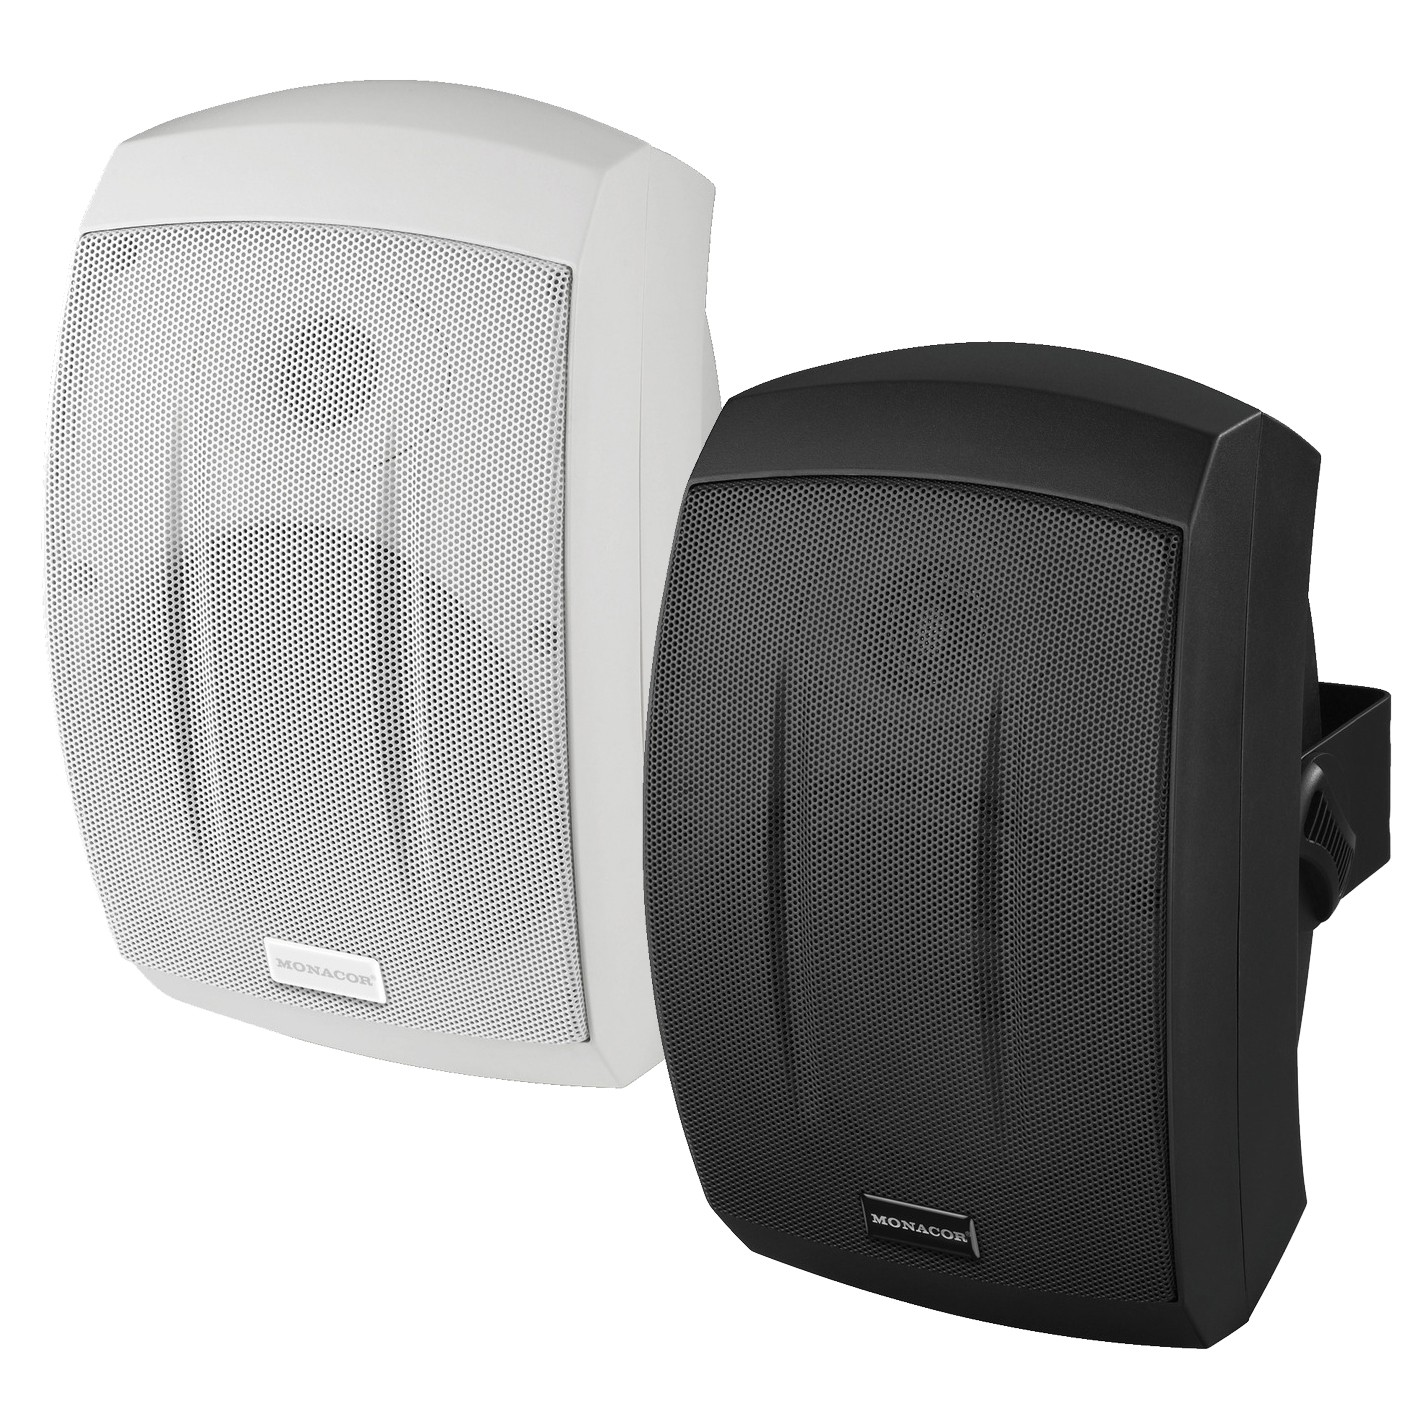 Monacor Esp 232 Series Wall Cabinet Speakers Sound Services